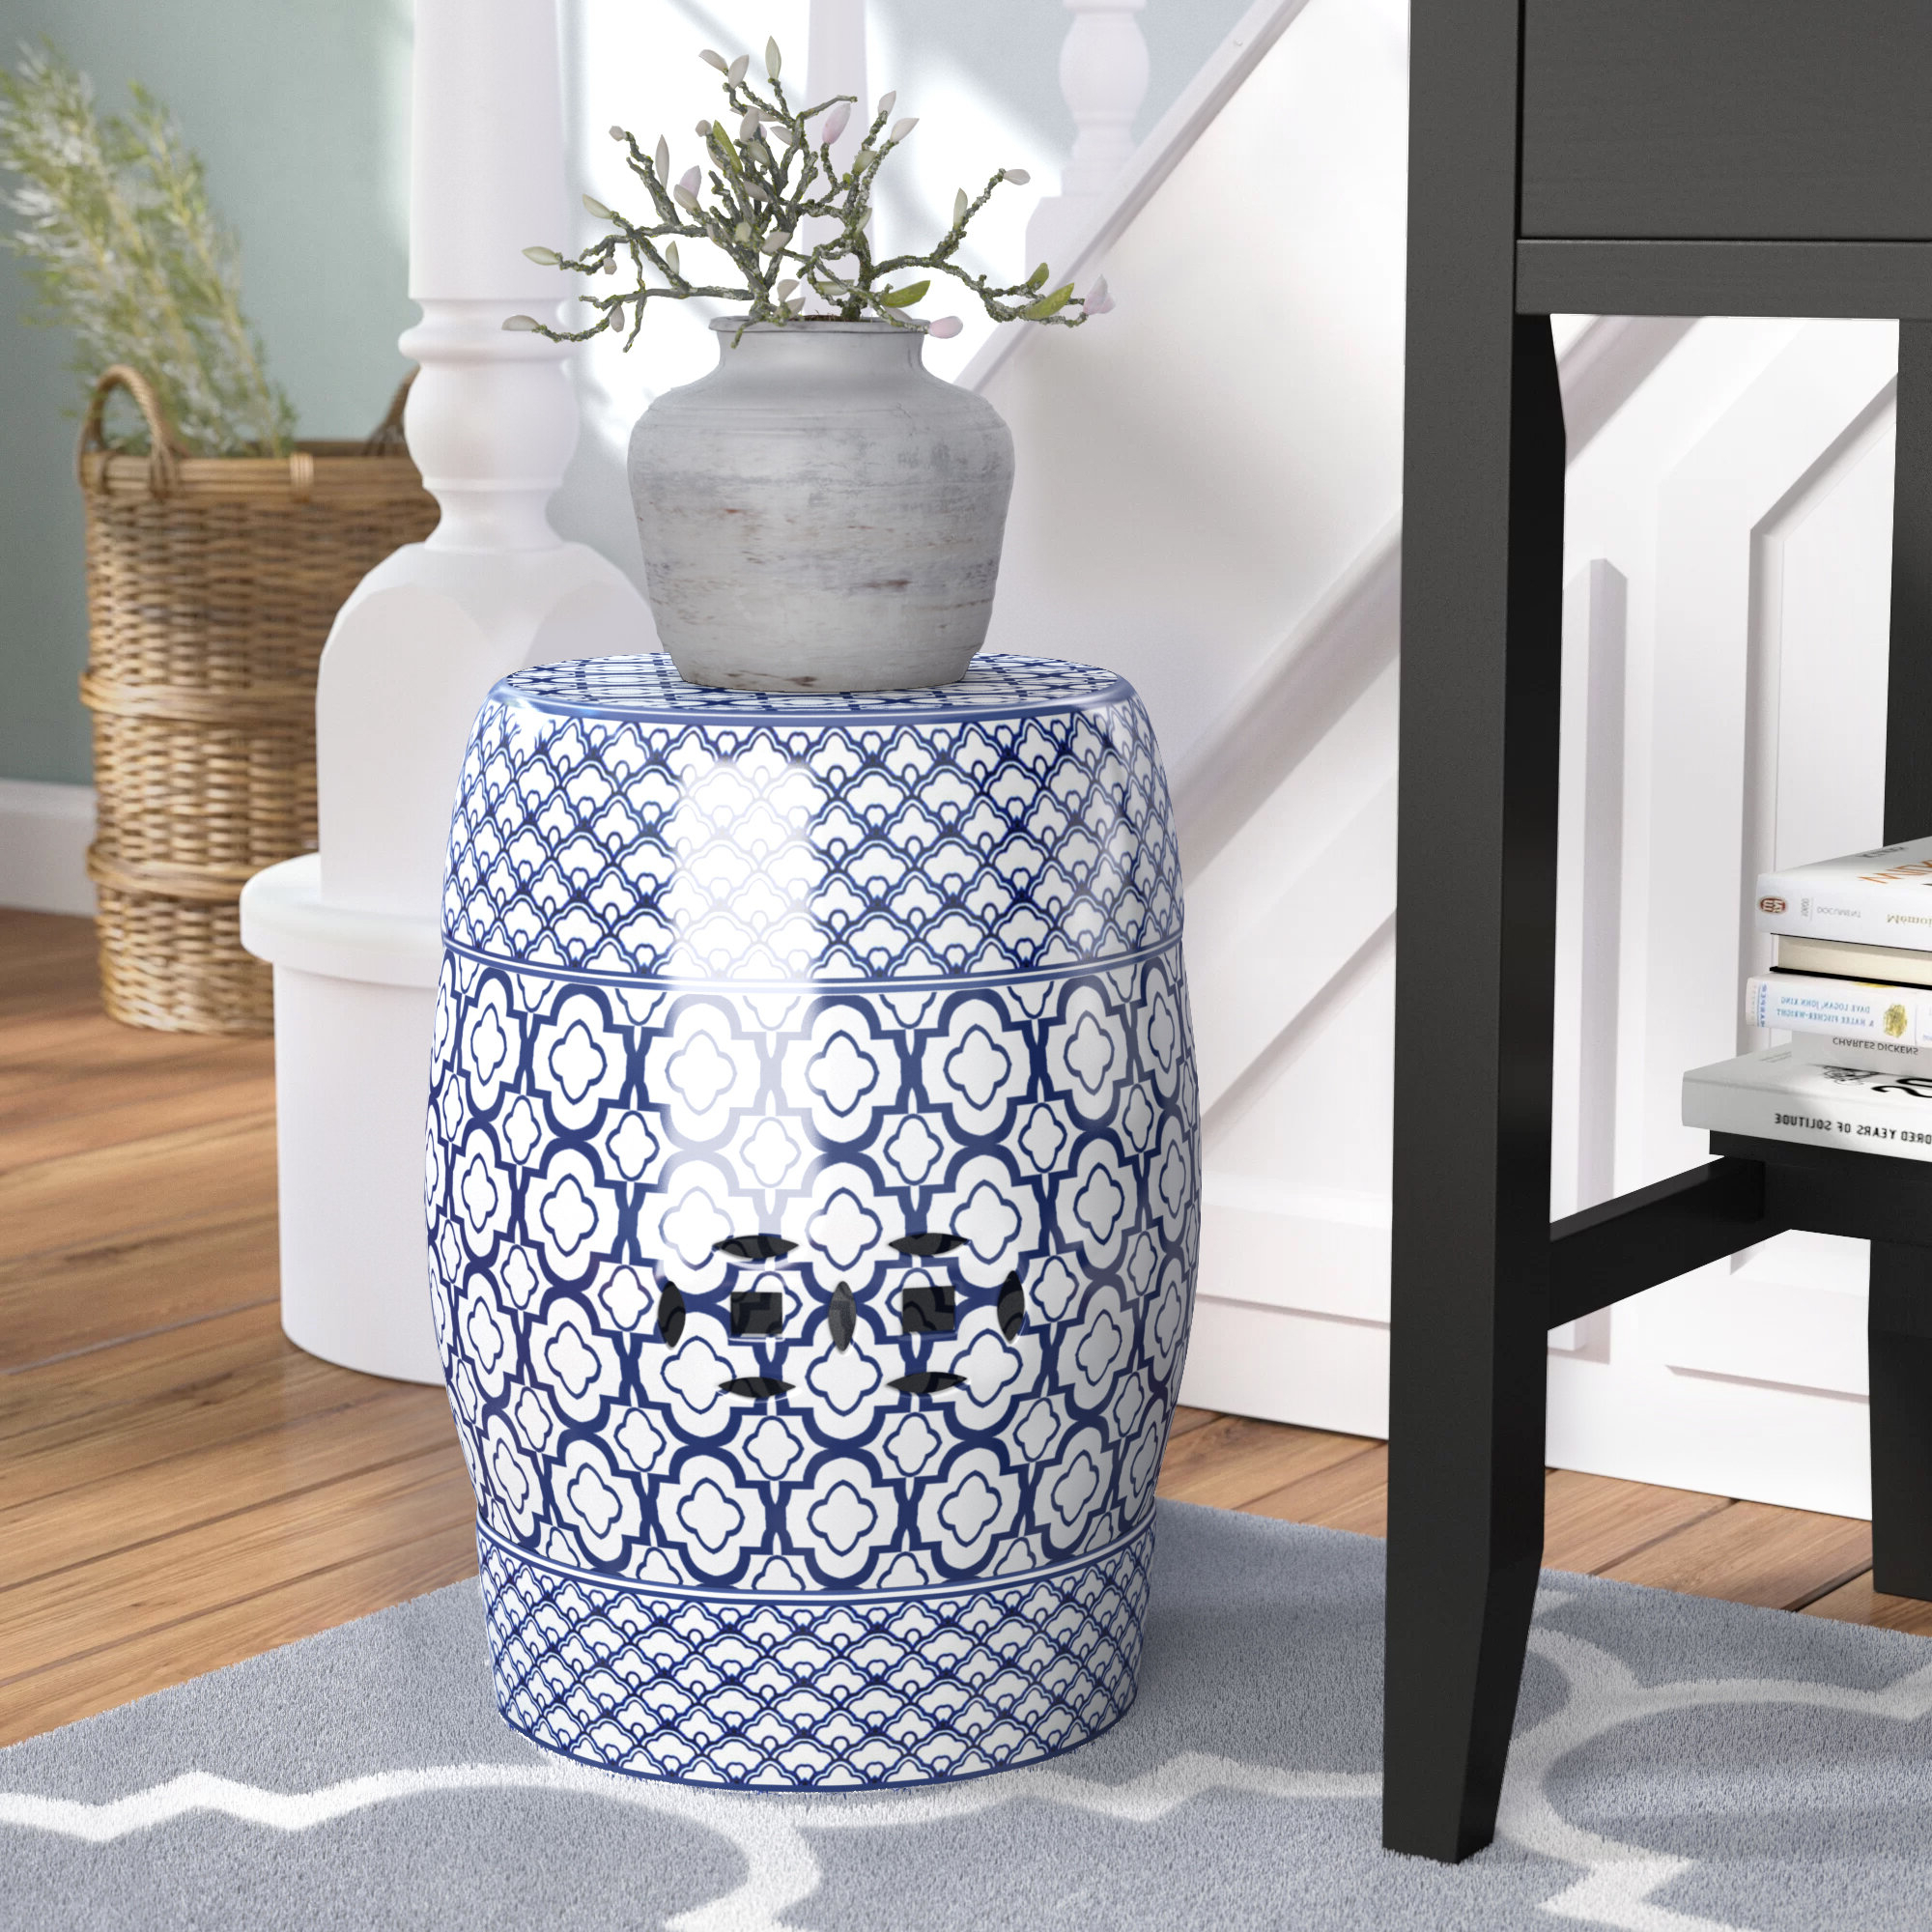 Keswick Ceramic Garden Stools With Regard To Fashionable Garden Stools (View 15 of 30)